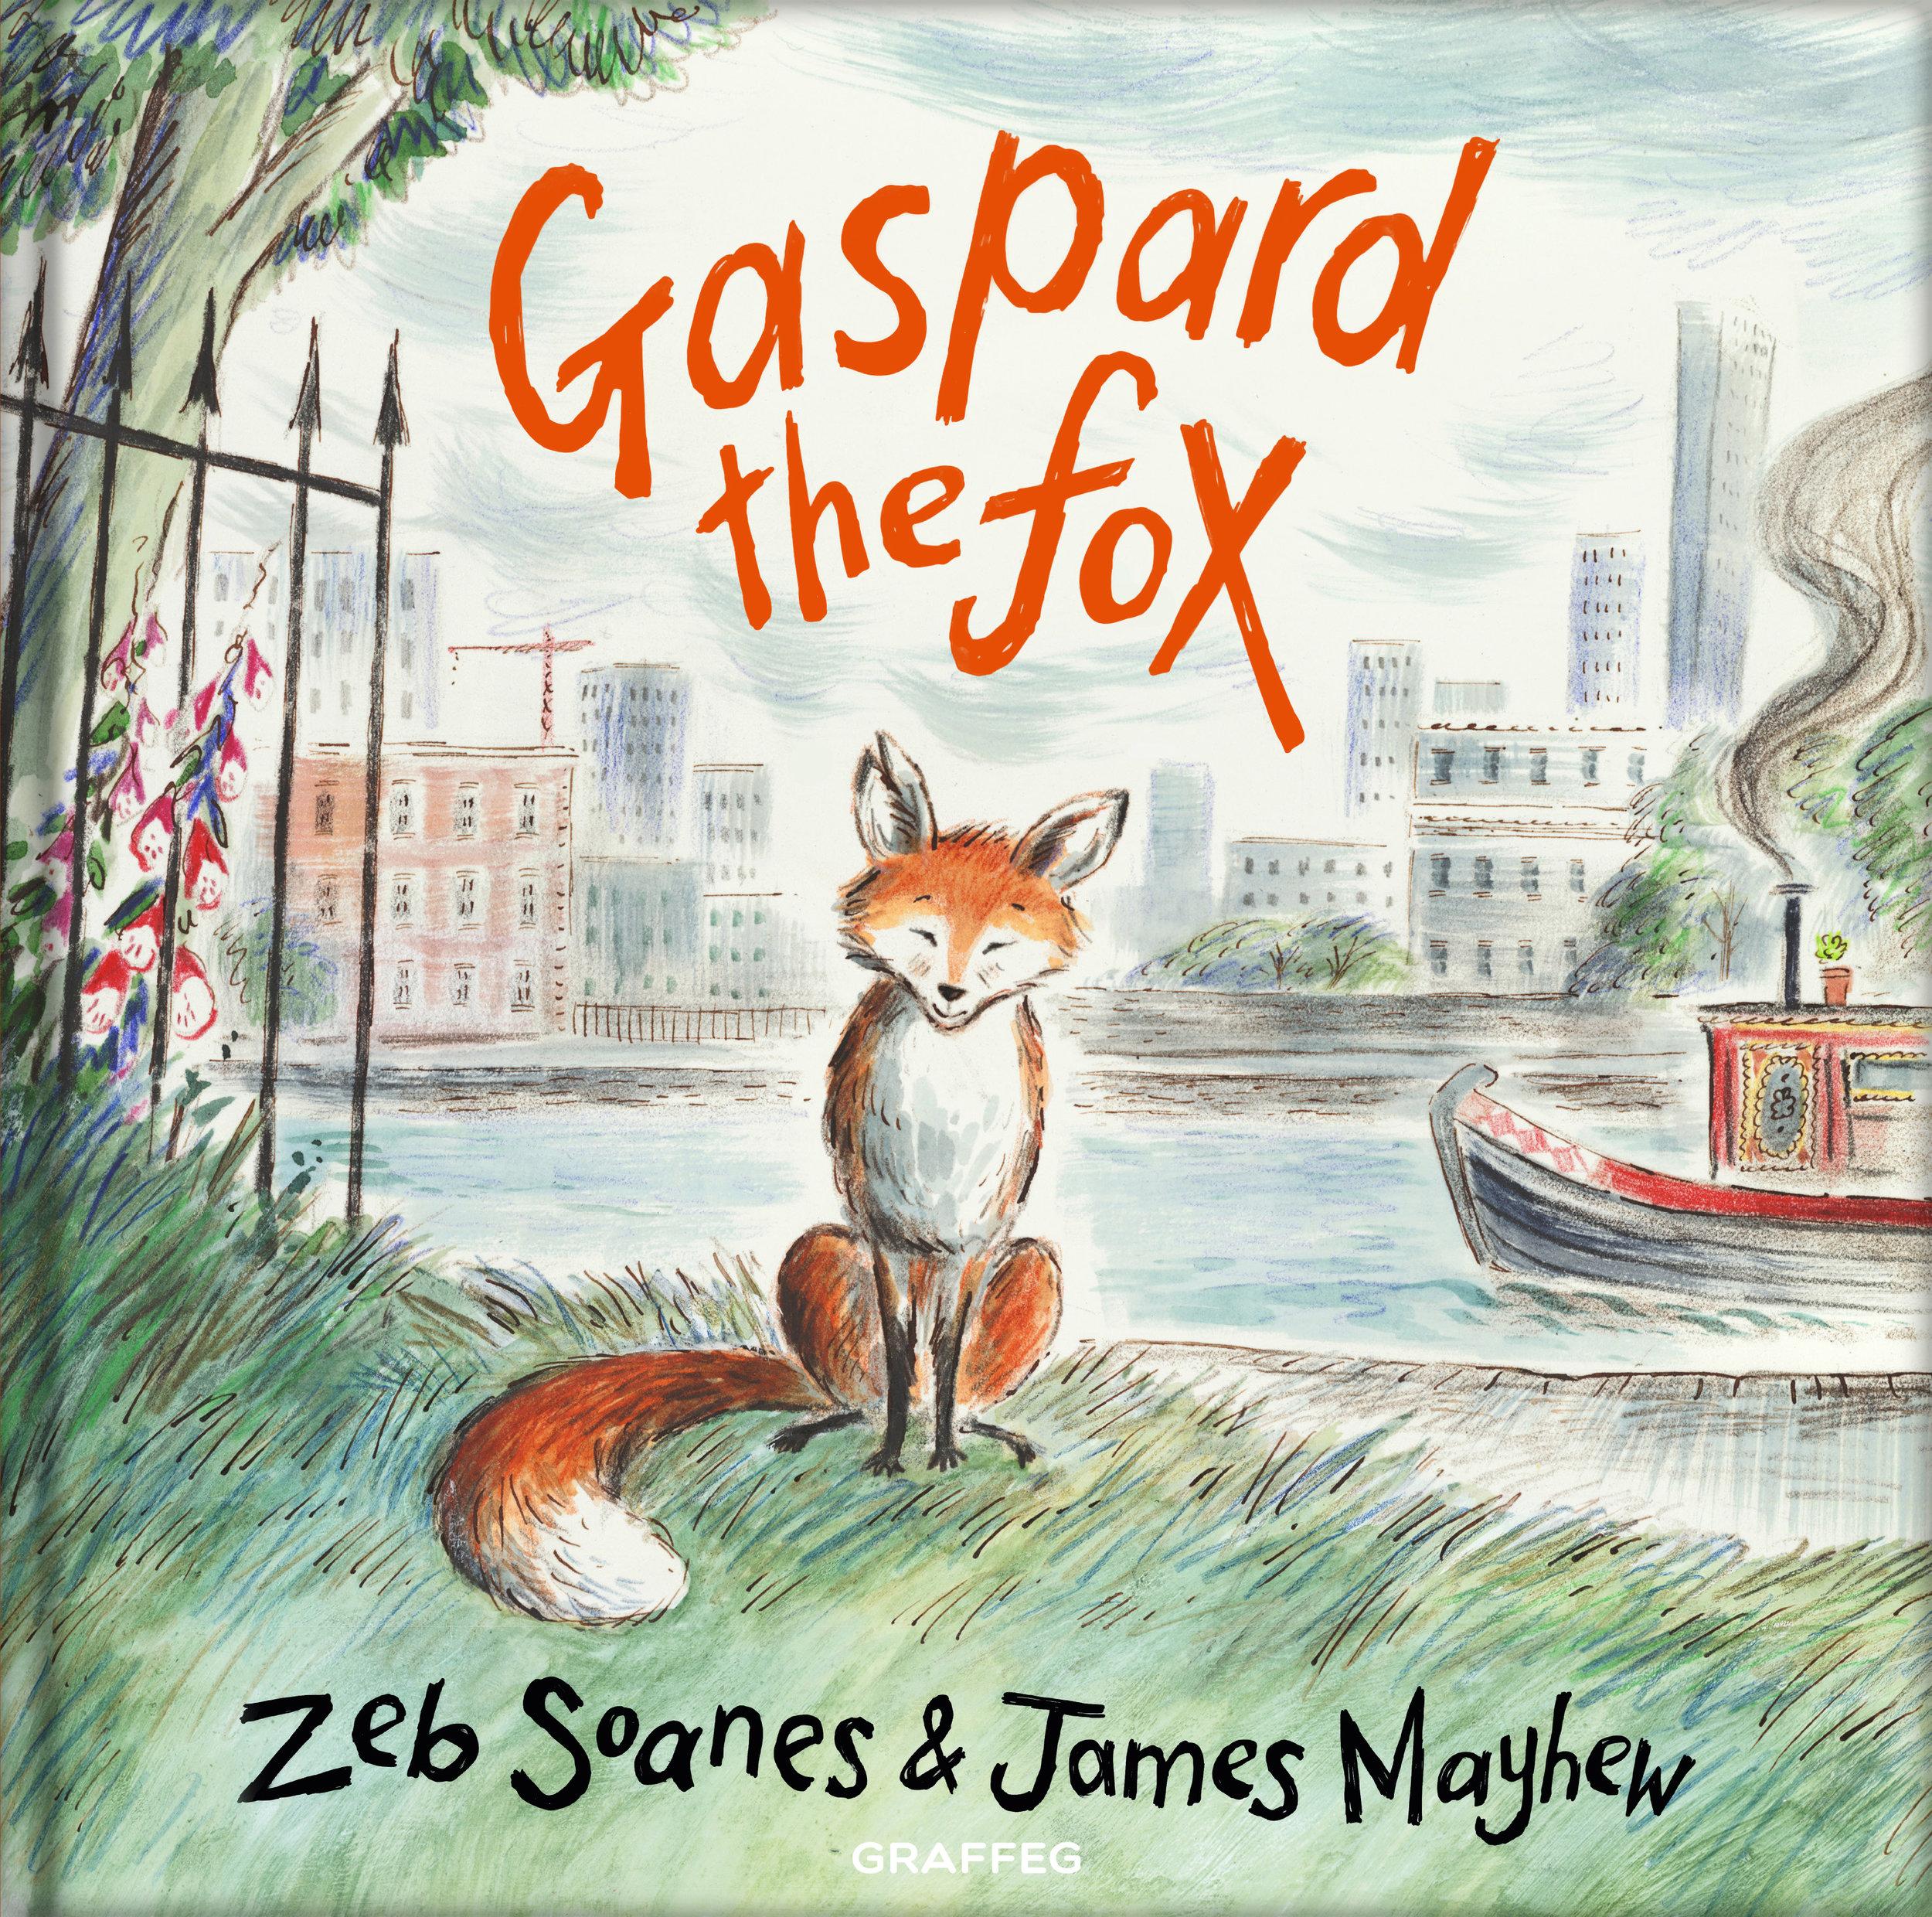 Gaspard the Fox_cover.jpg